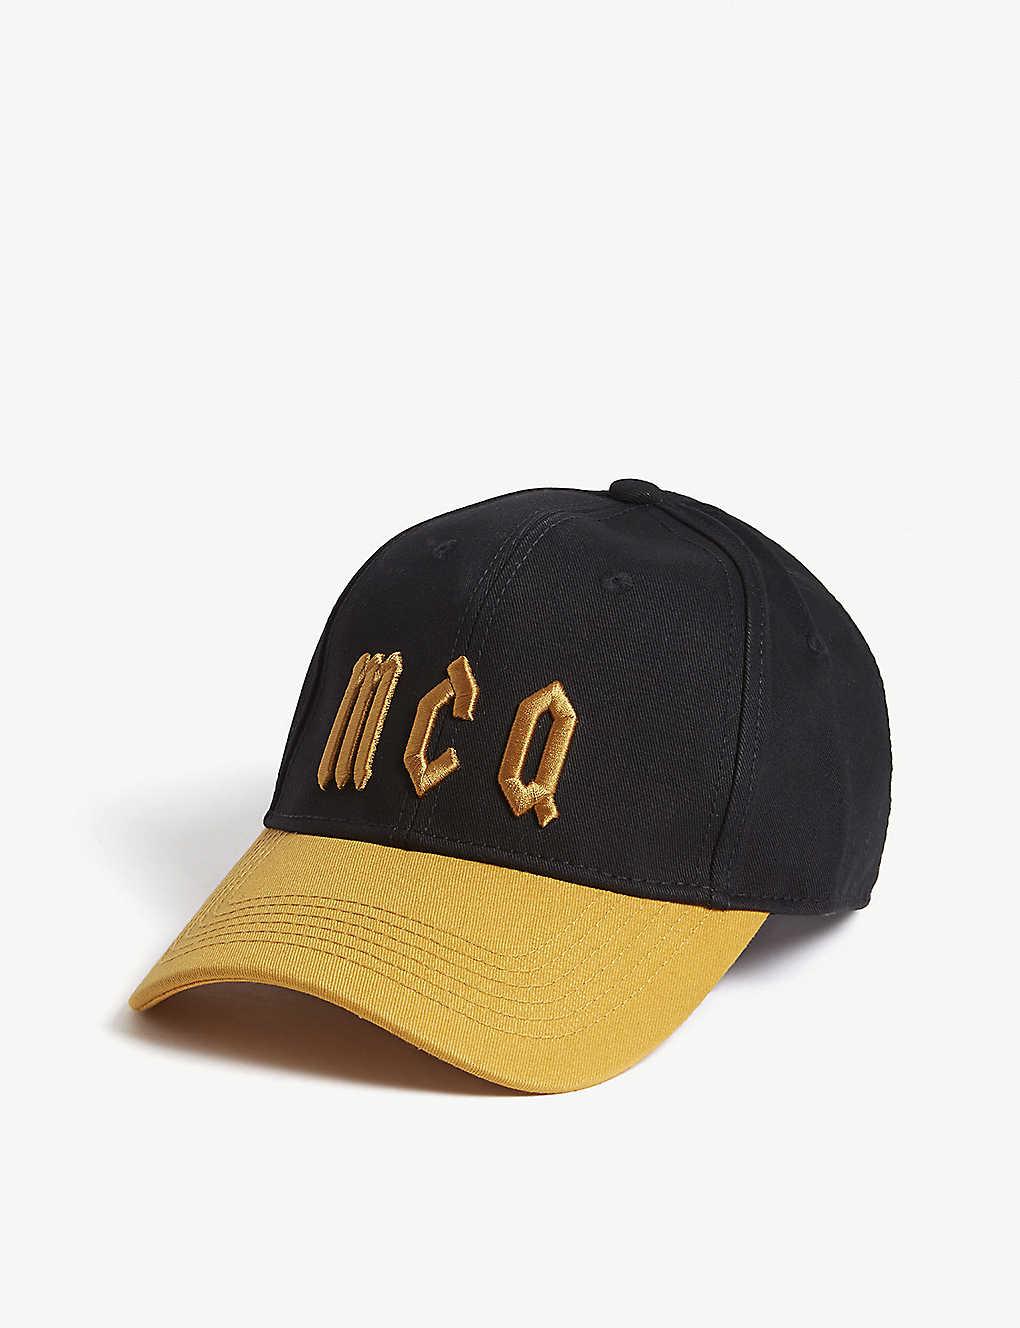 ad626c81096b6 MCQ ALEXANDER MCQUEEN - Logo cotton baseball cap